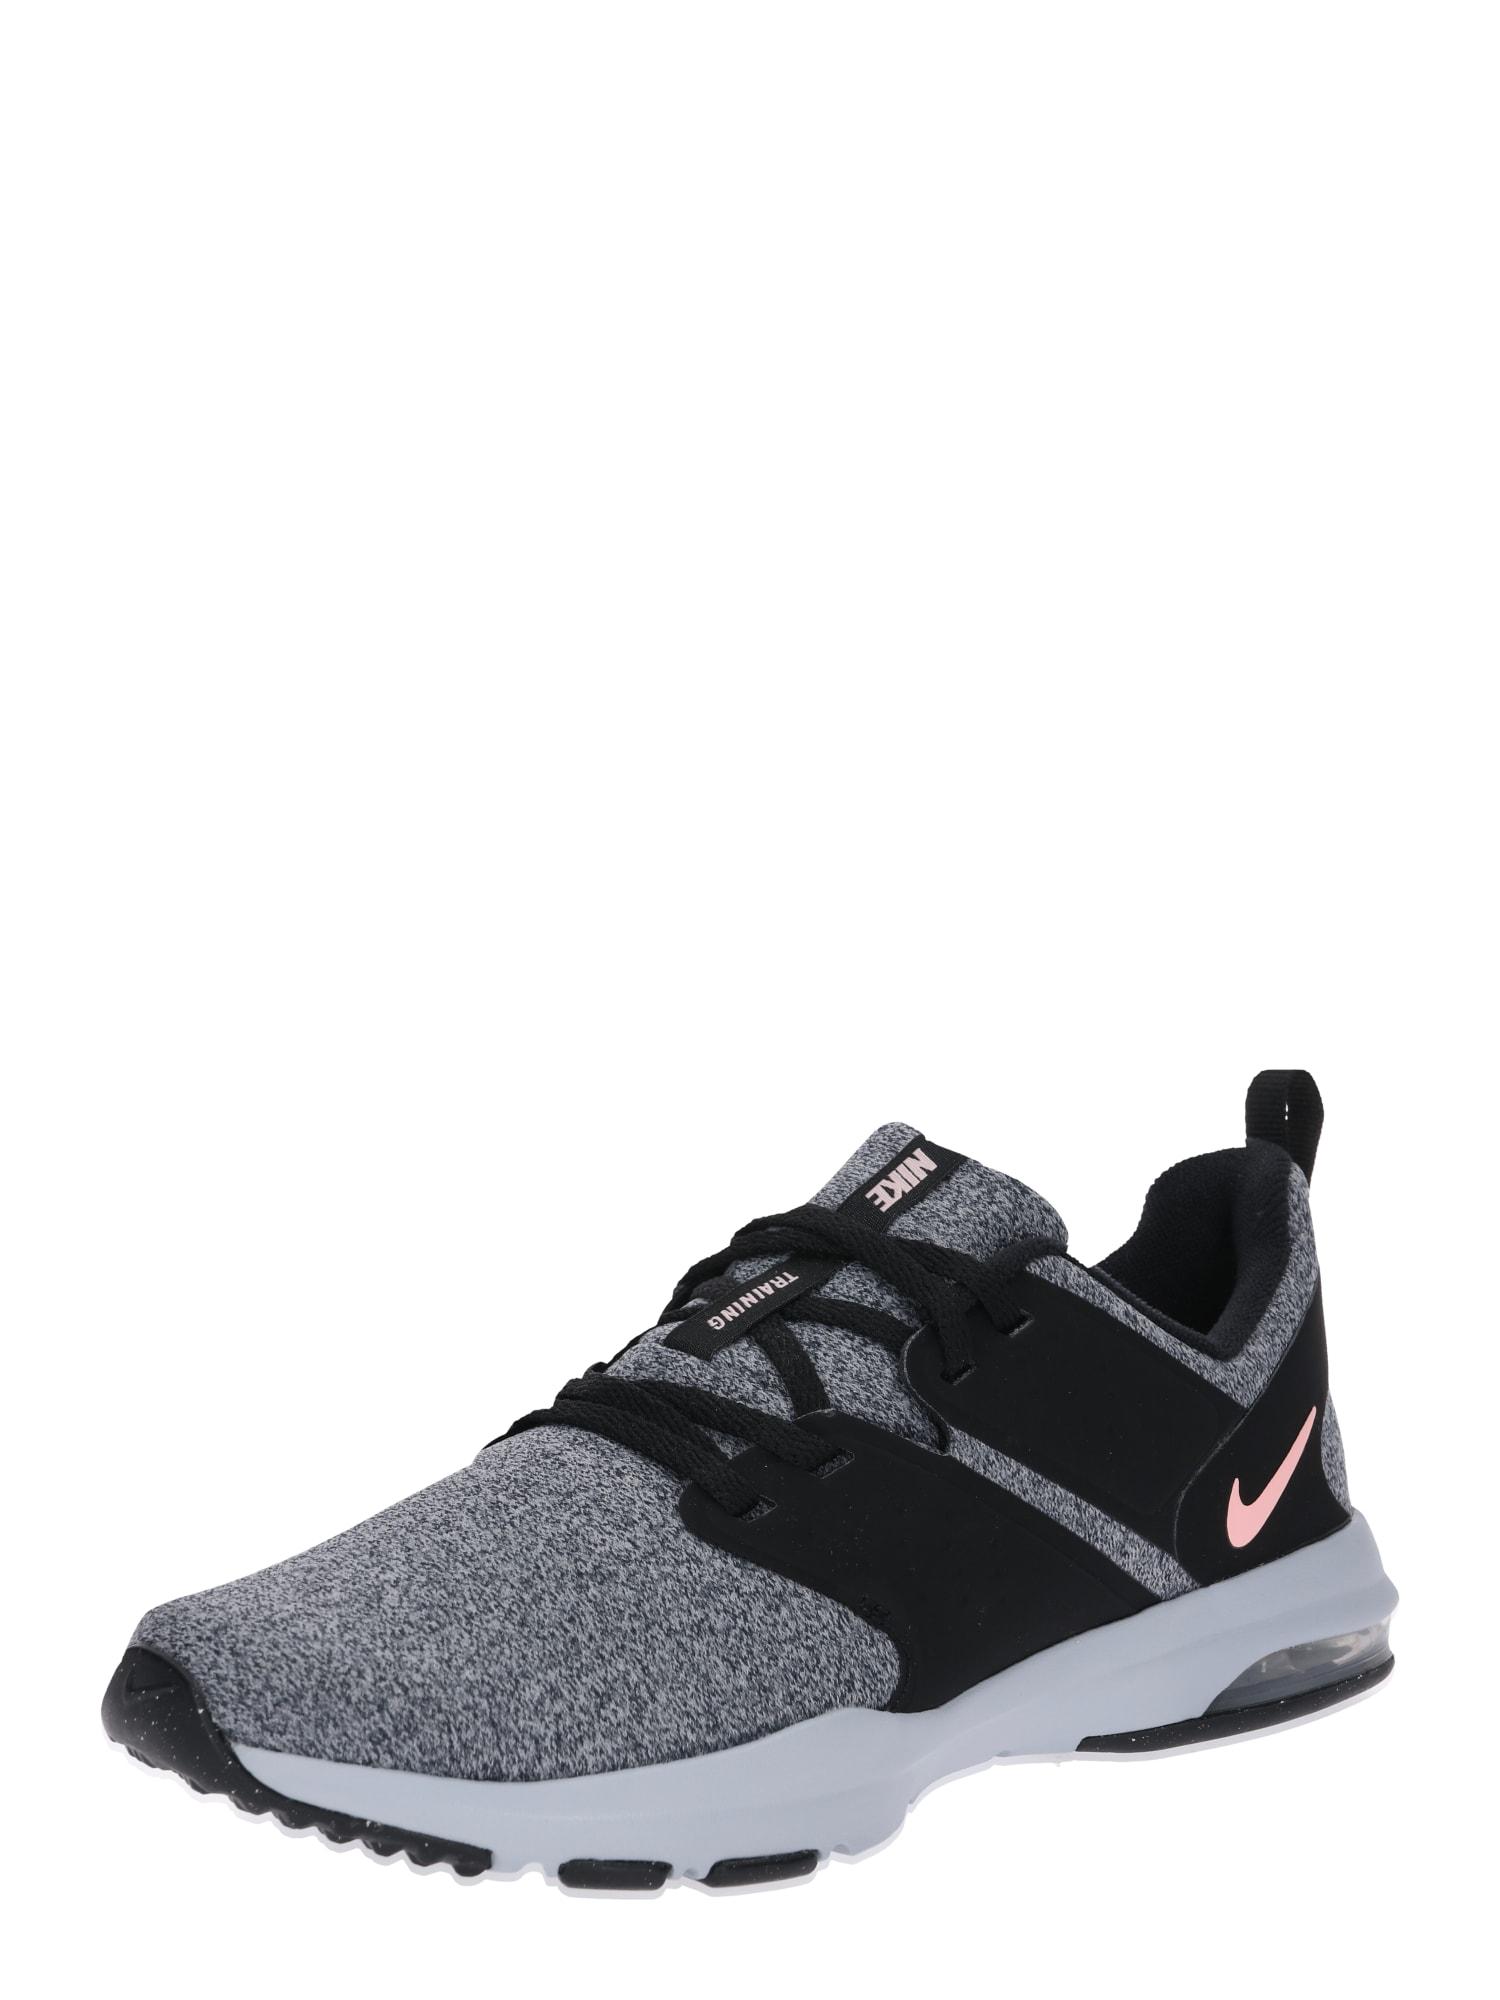 Sportovní boty Air Bella TR šedá korálová černá NIKE